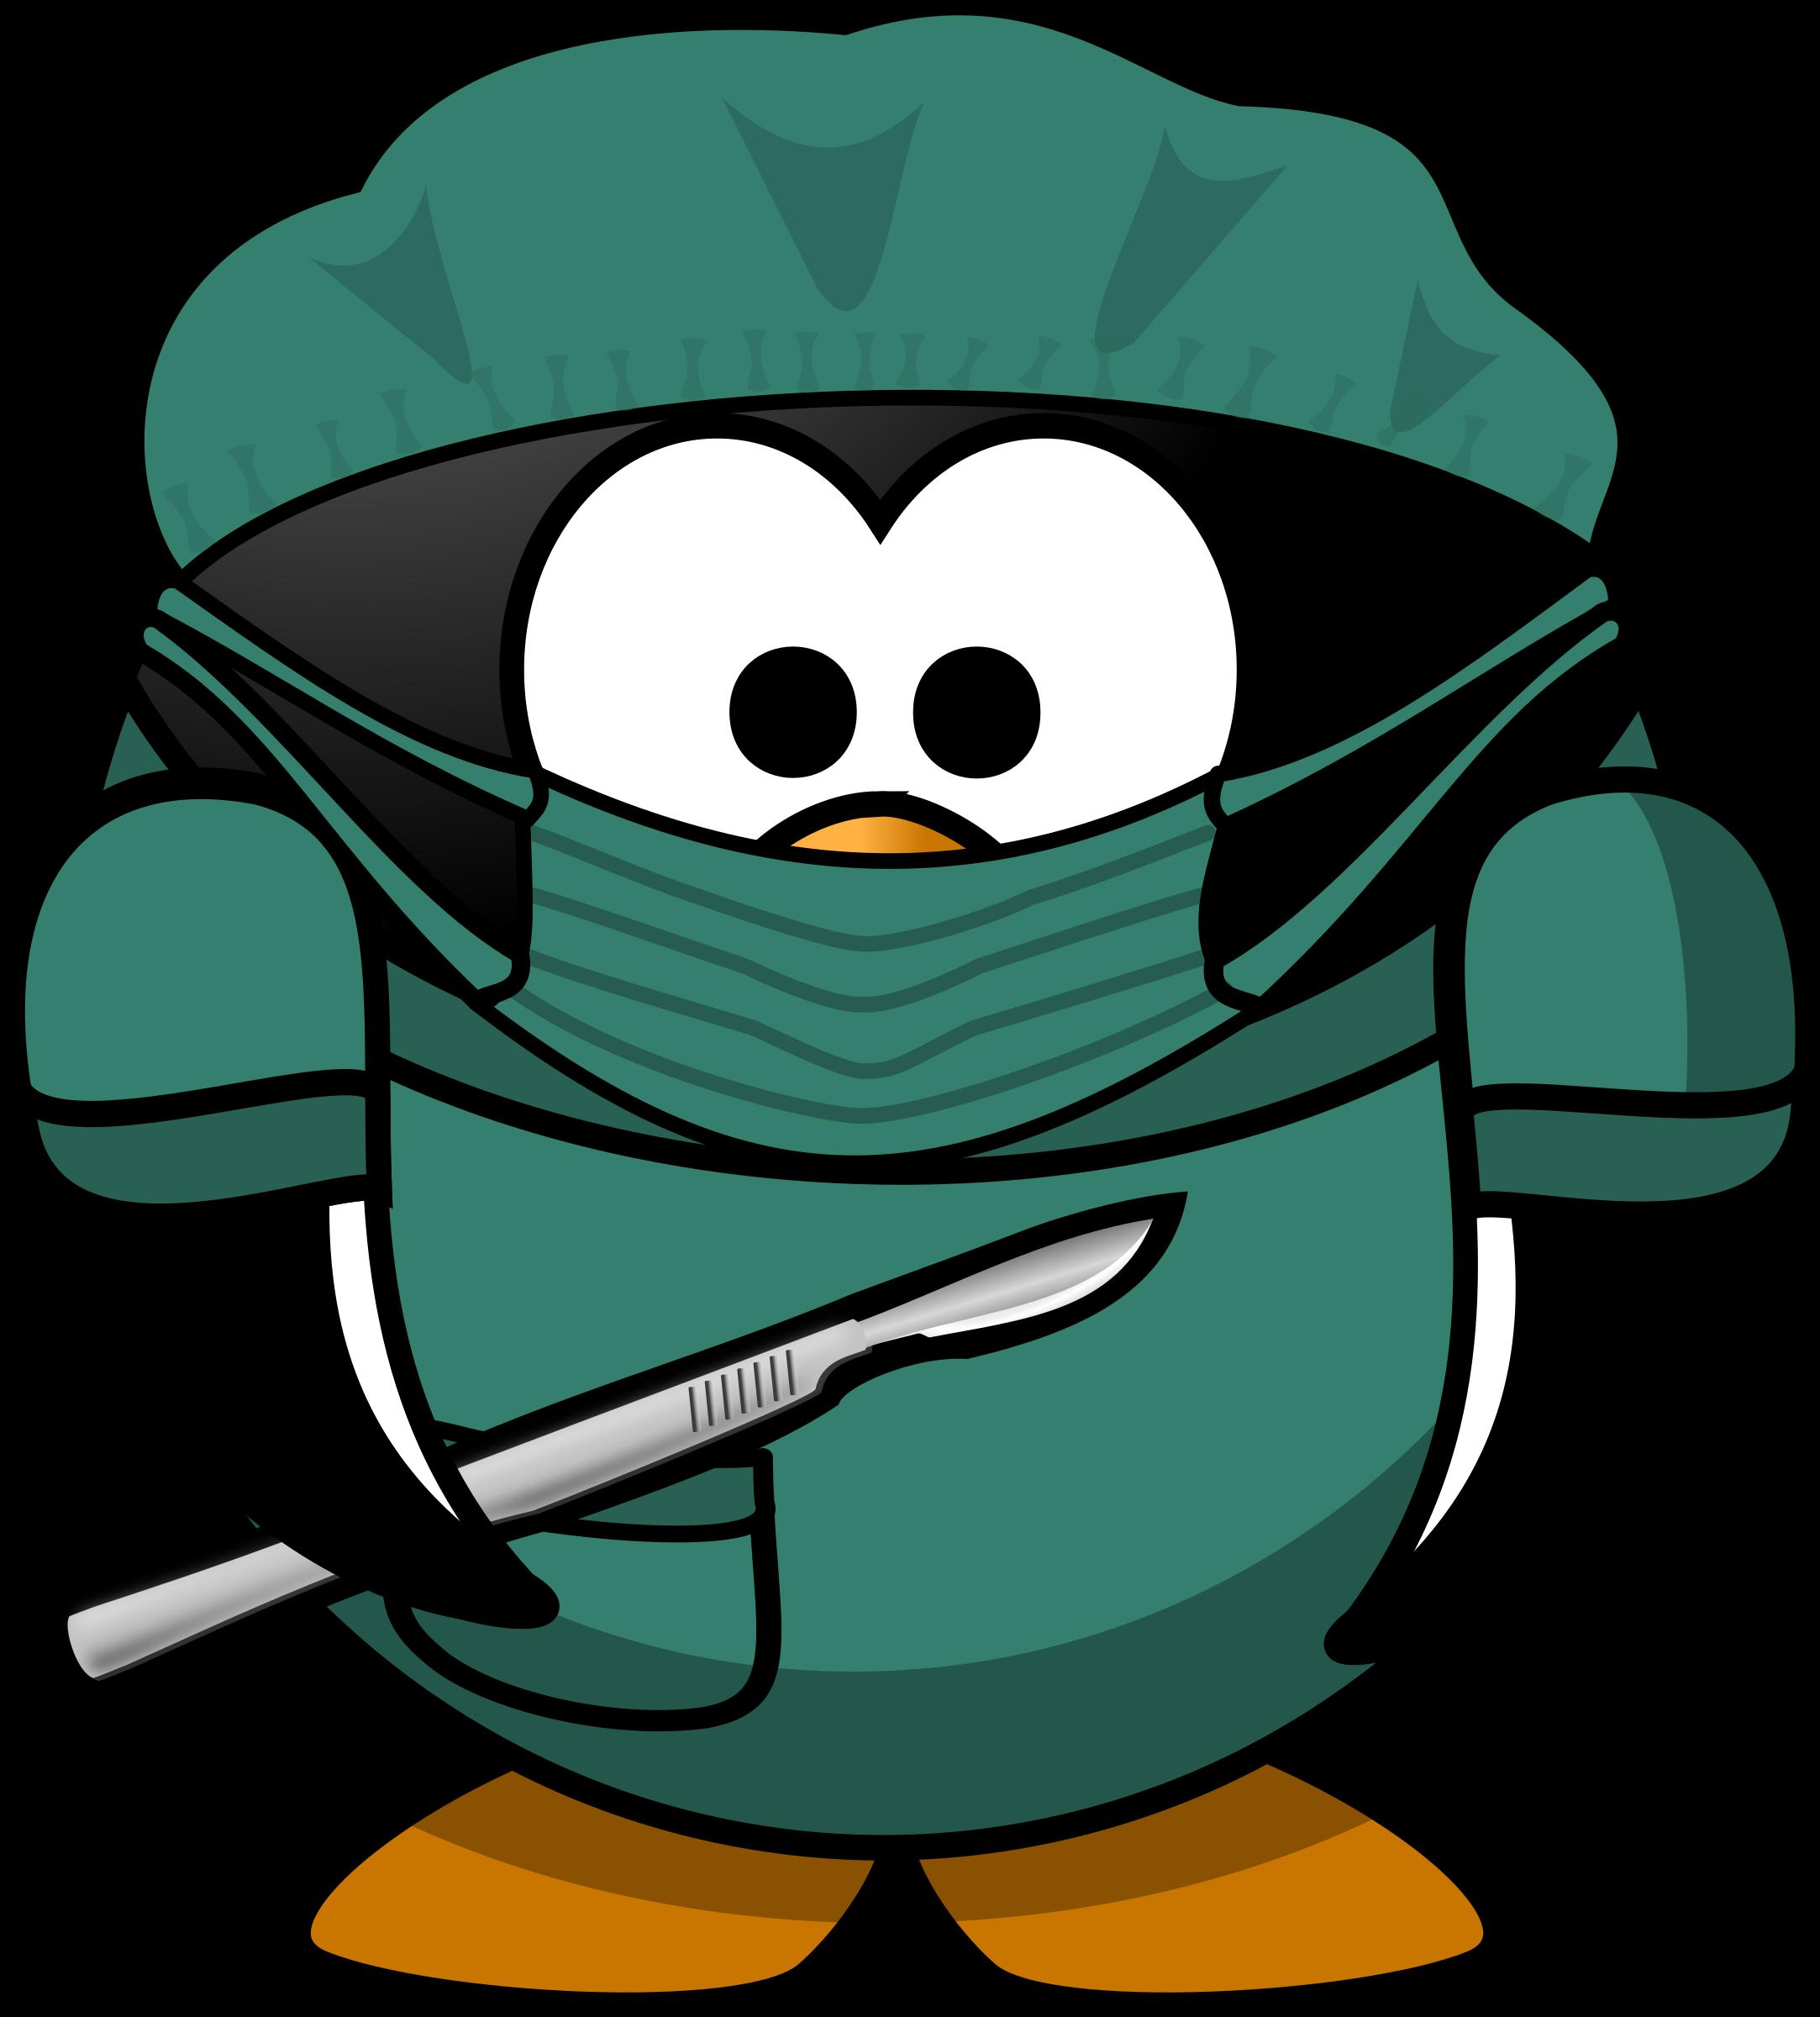 Doctor Bird clipart #5, Download drawings